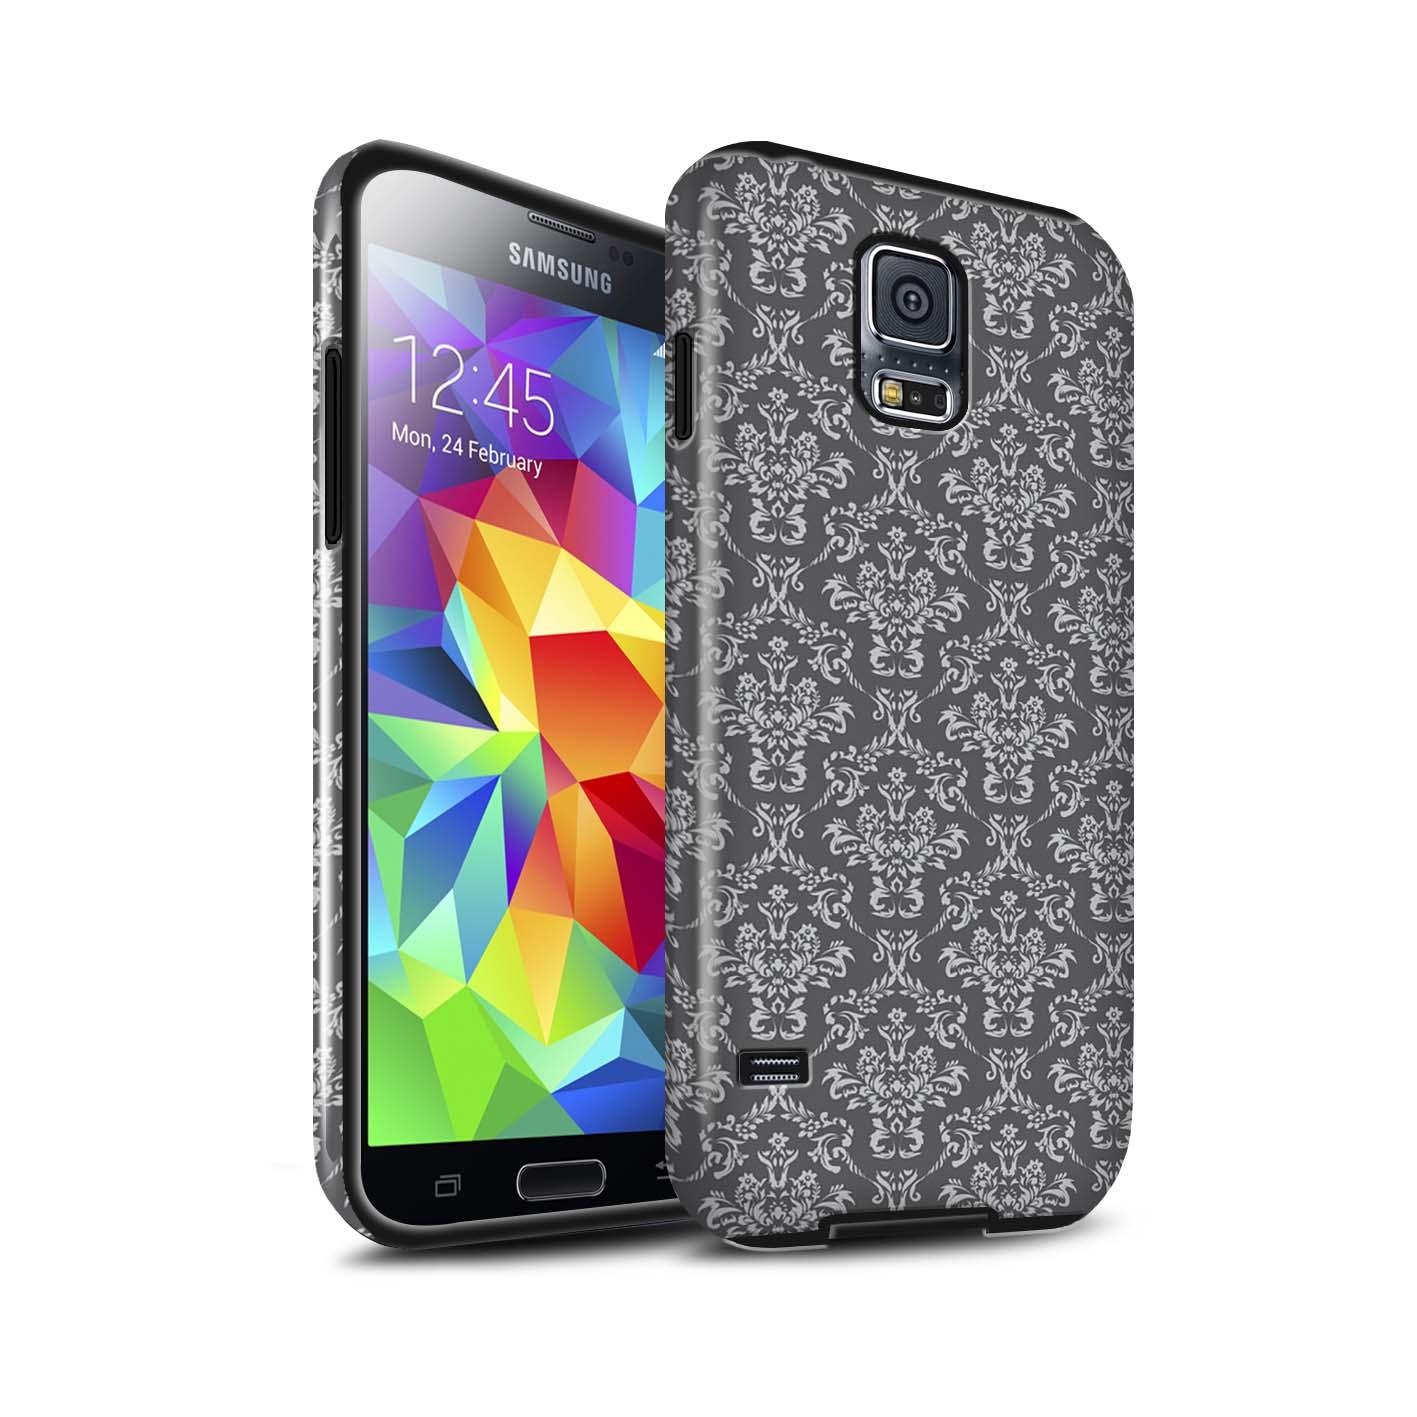 Robuste-Brillant-Coque-Etui-pour-Samsung-Galaxy-S5-Neo-G903-Mode-Hivernale